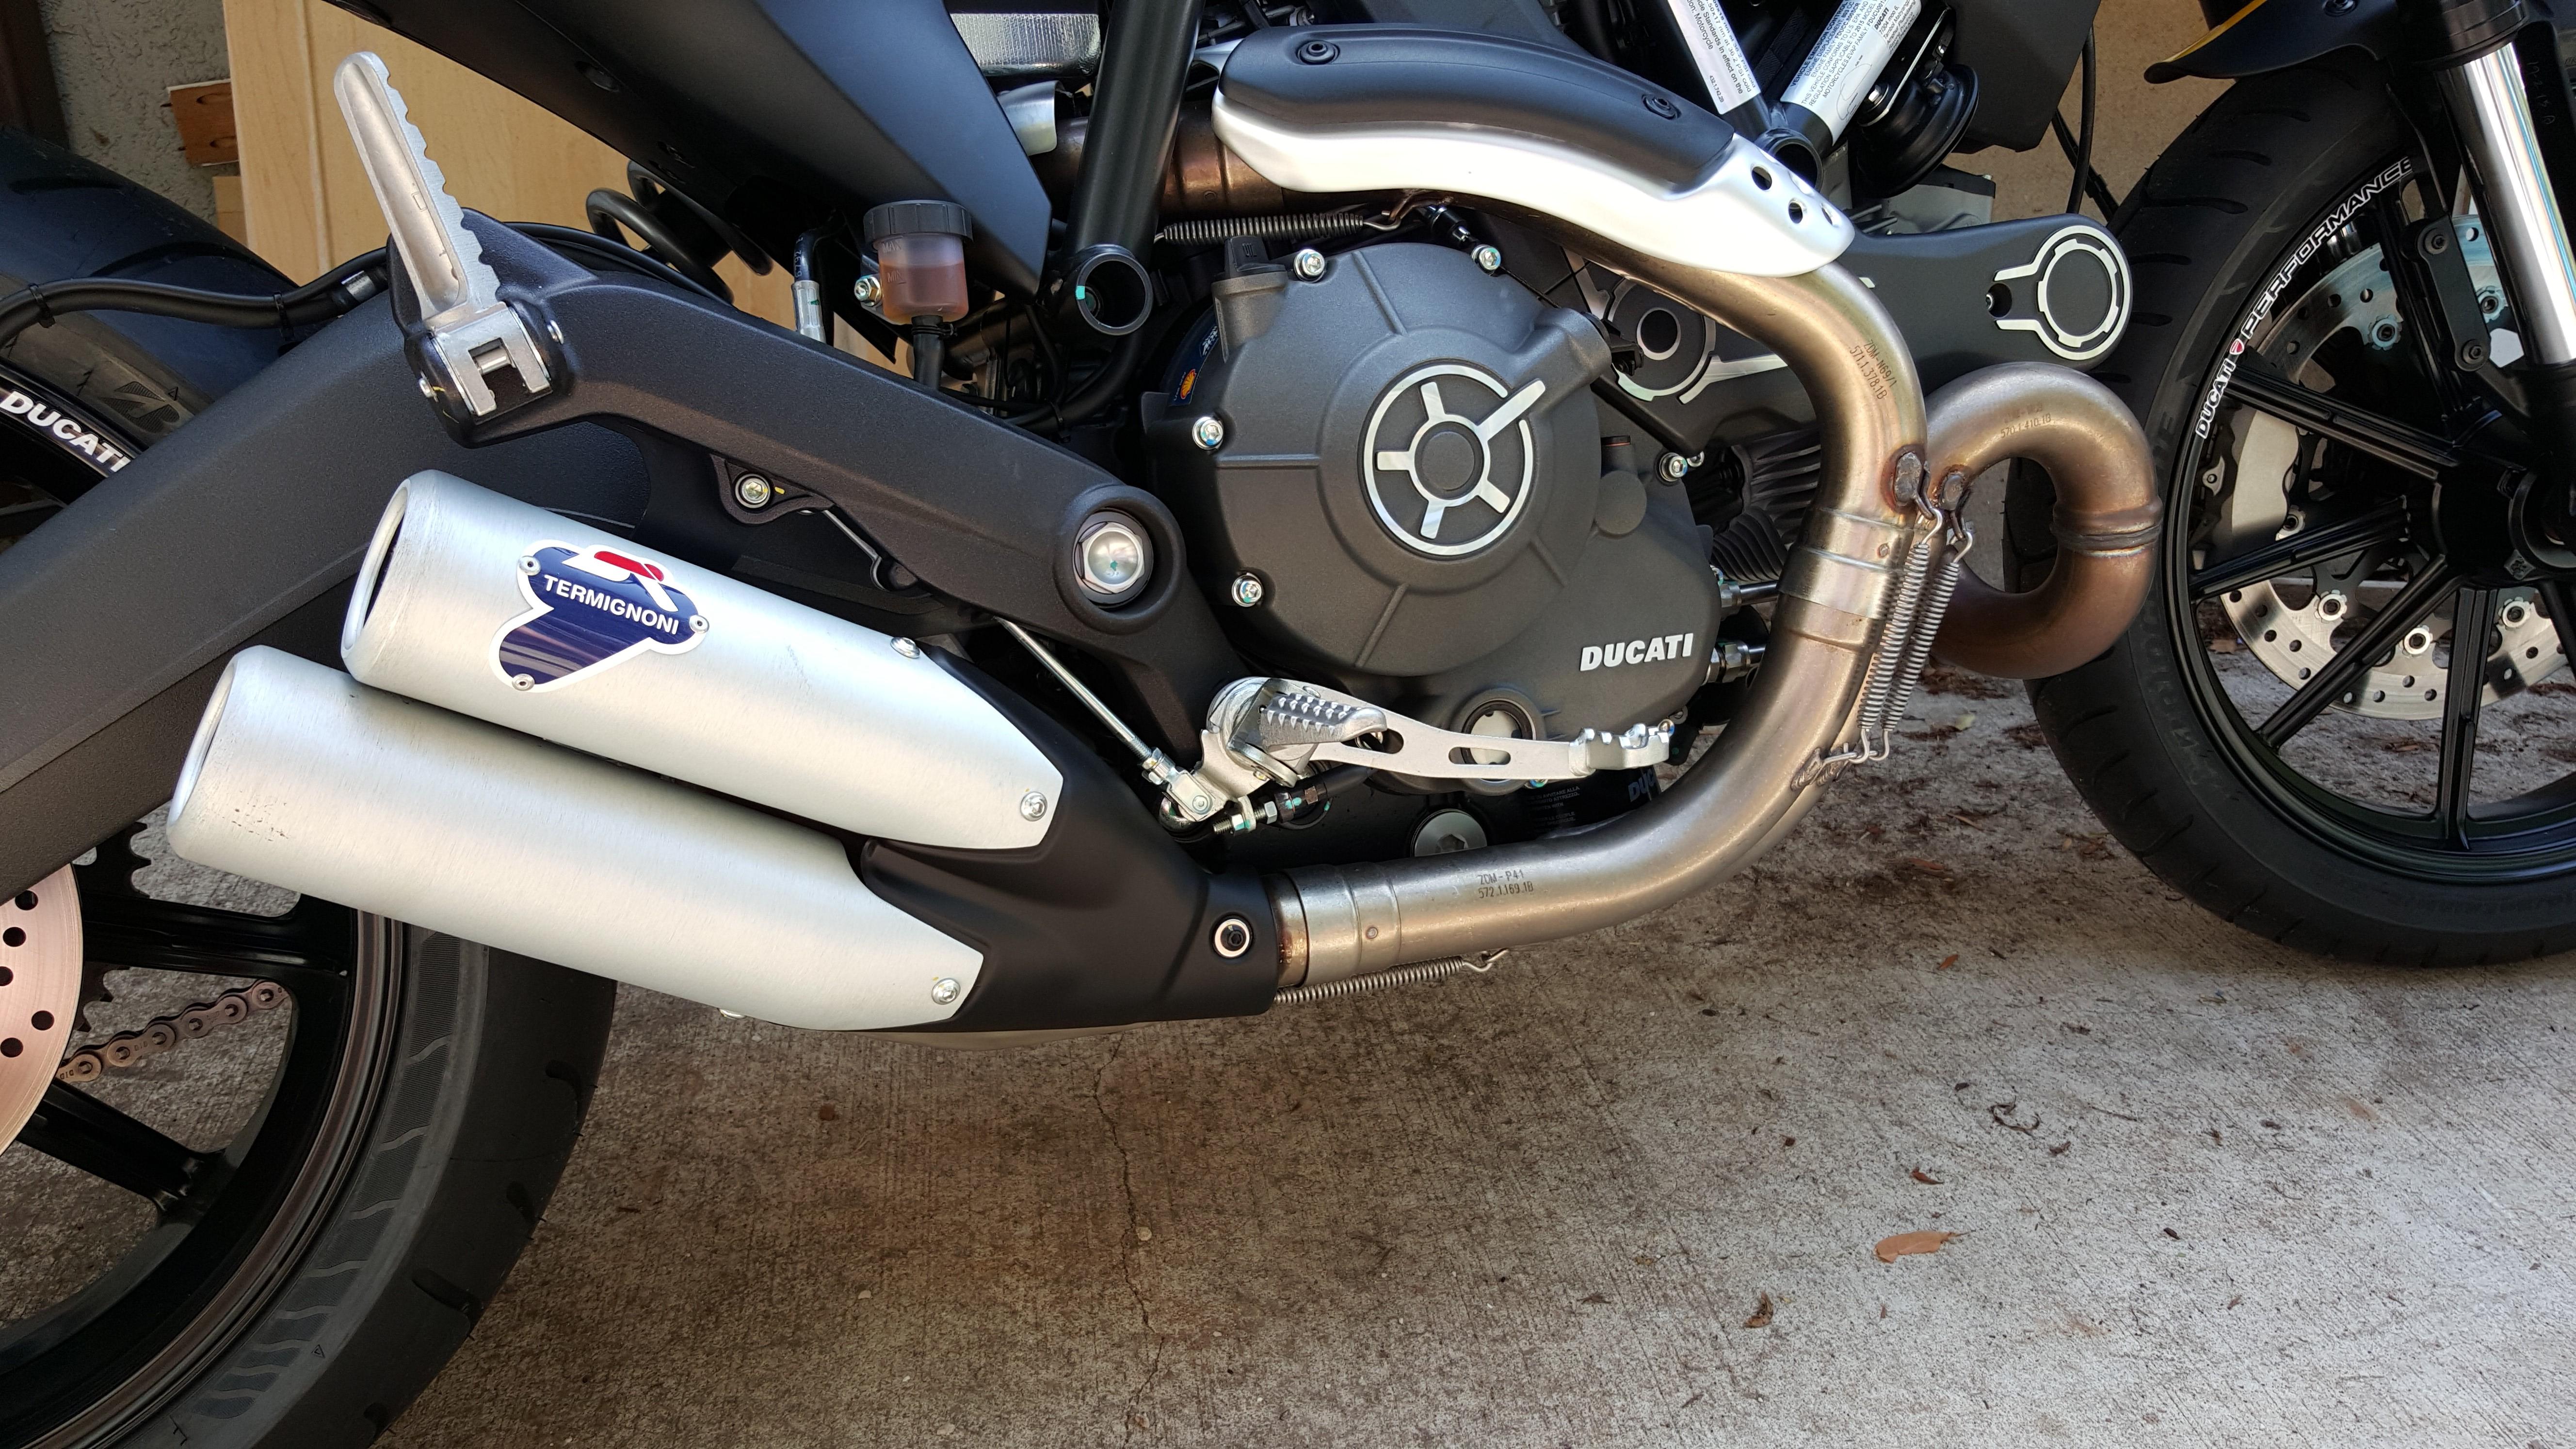 Full Throttle Factory Termignoni Exhaust For Sale 450 Ducati